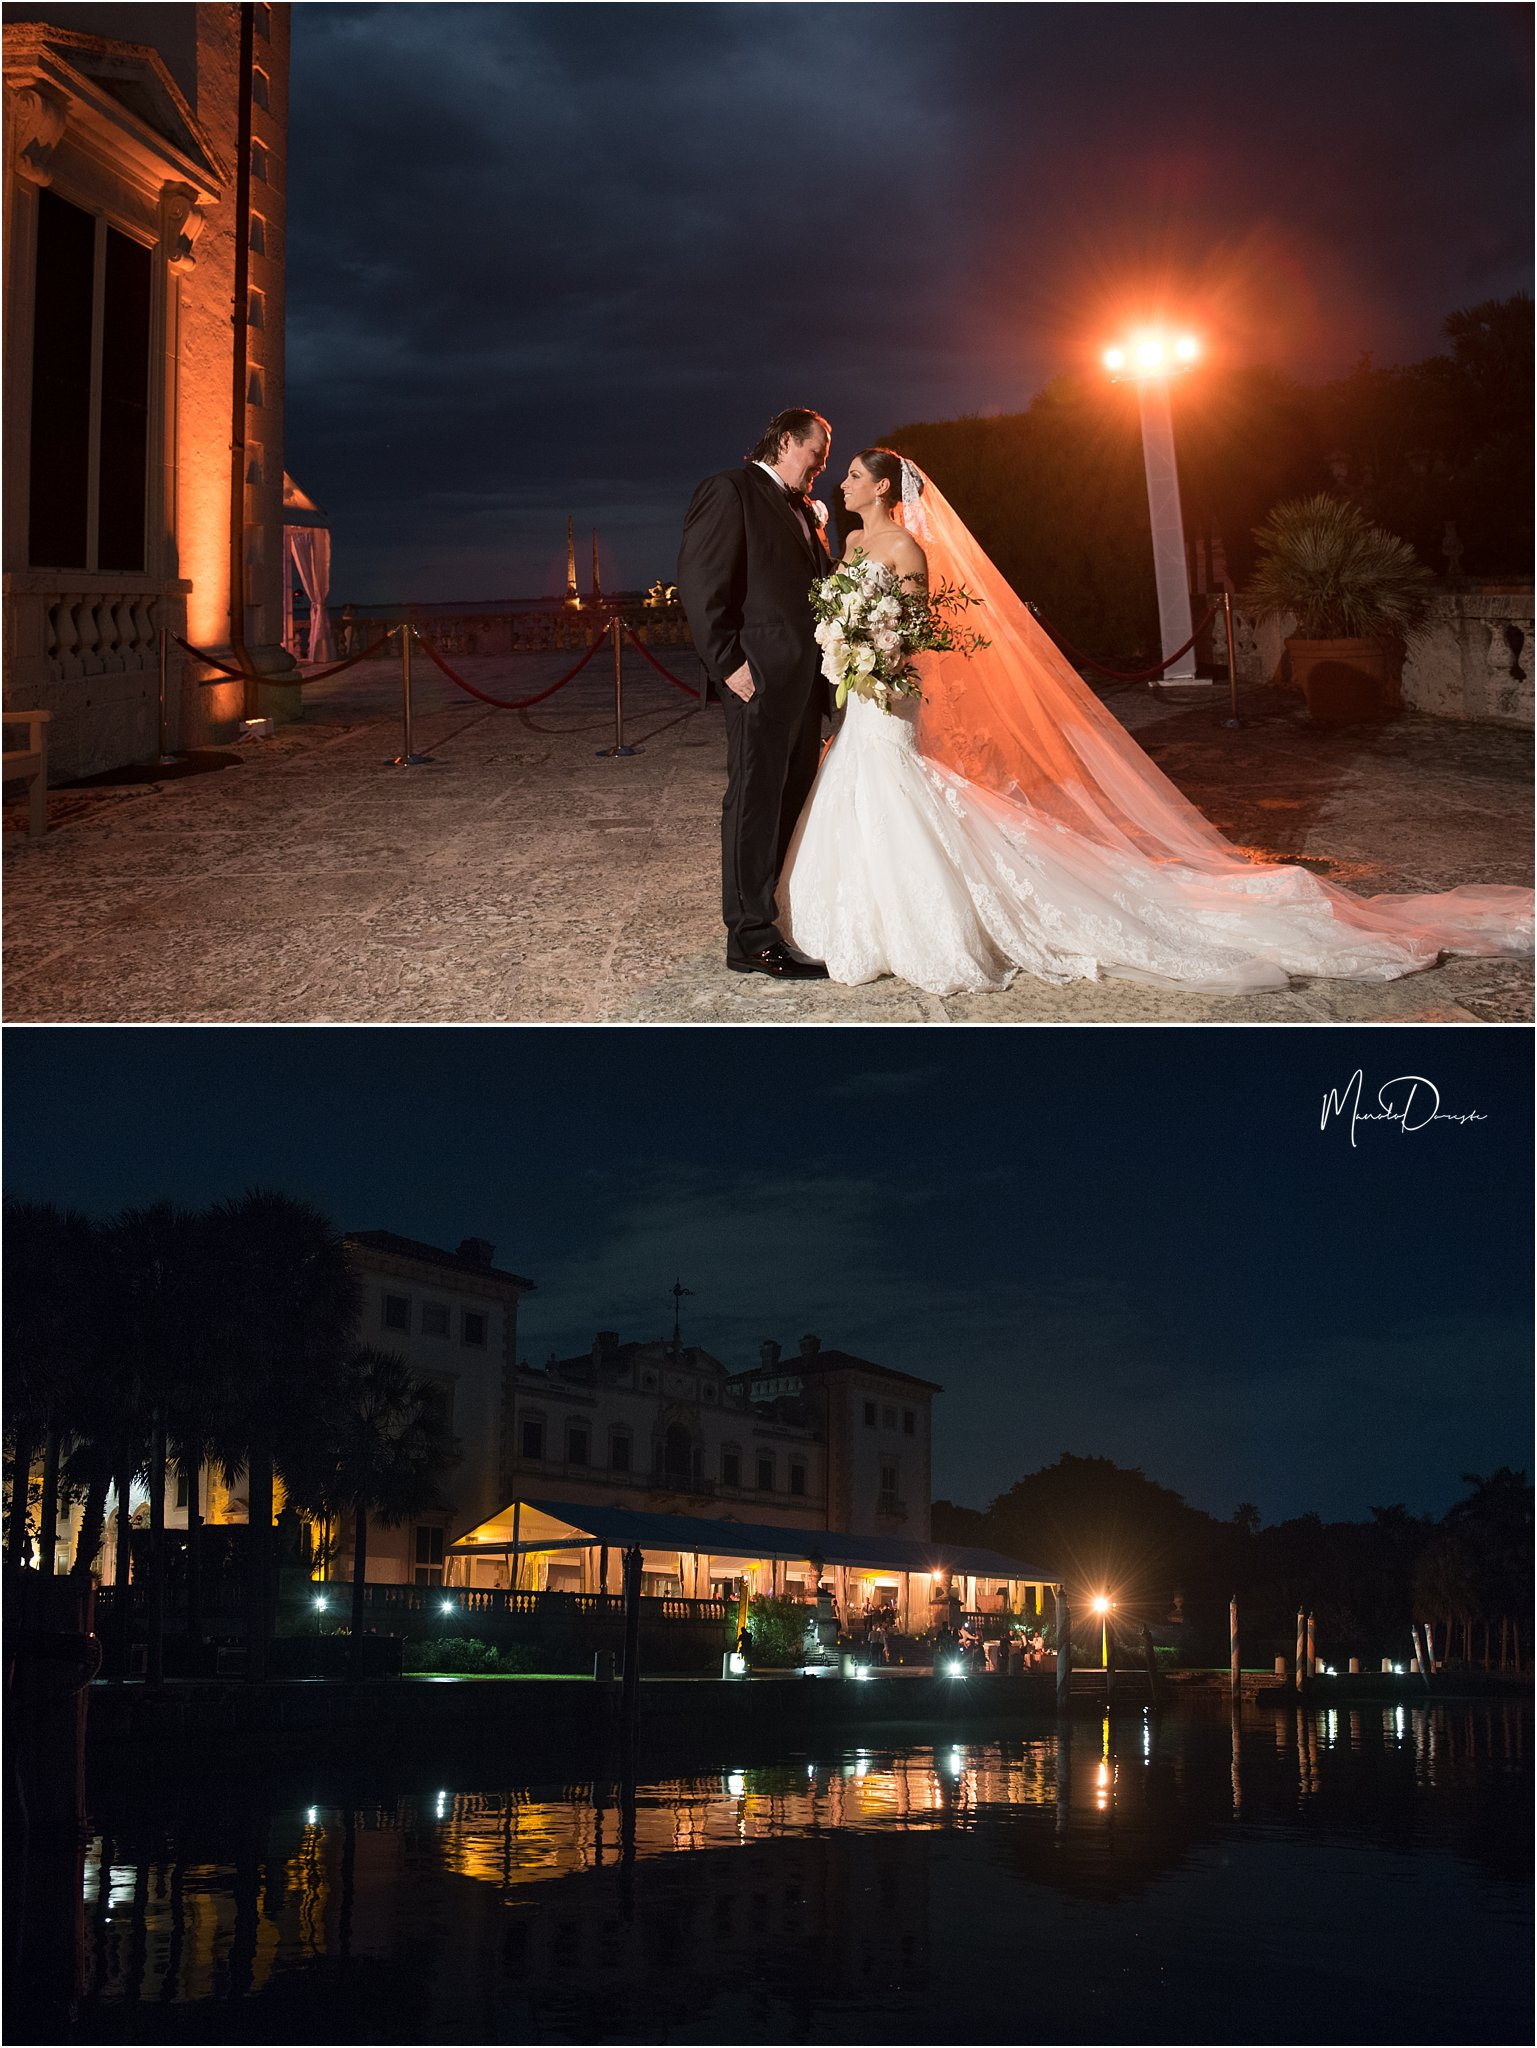 00764_ManoloDoreste_InFocusStudios_Wedding_Family_Photography_Miami_MiamiPhotographer.jpg